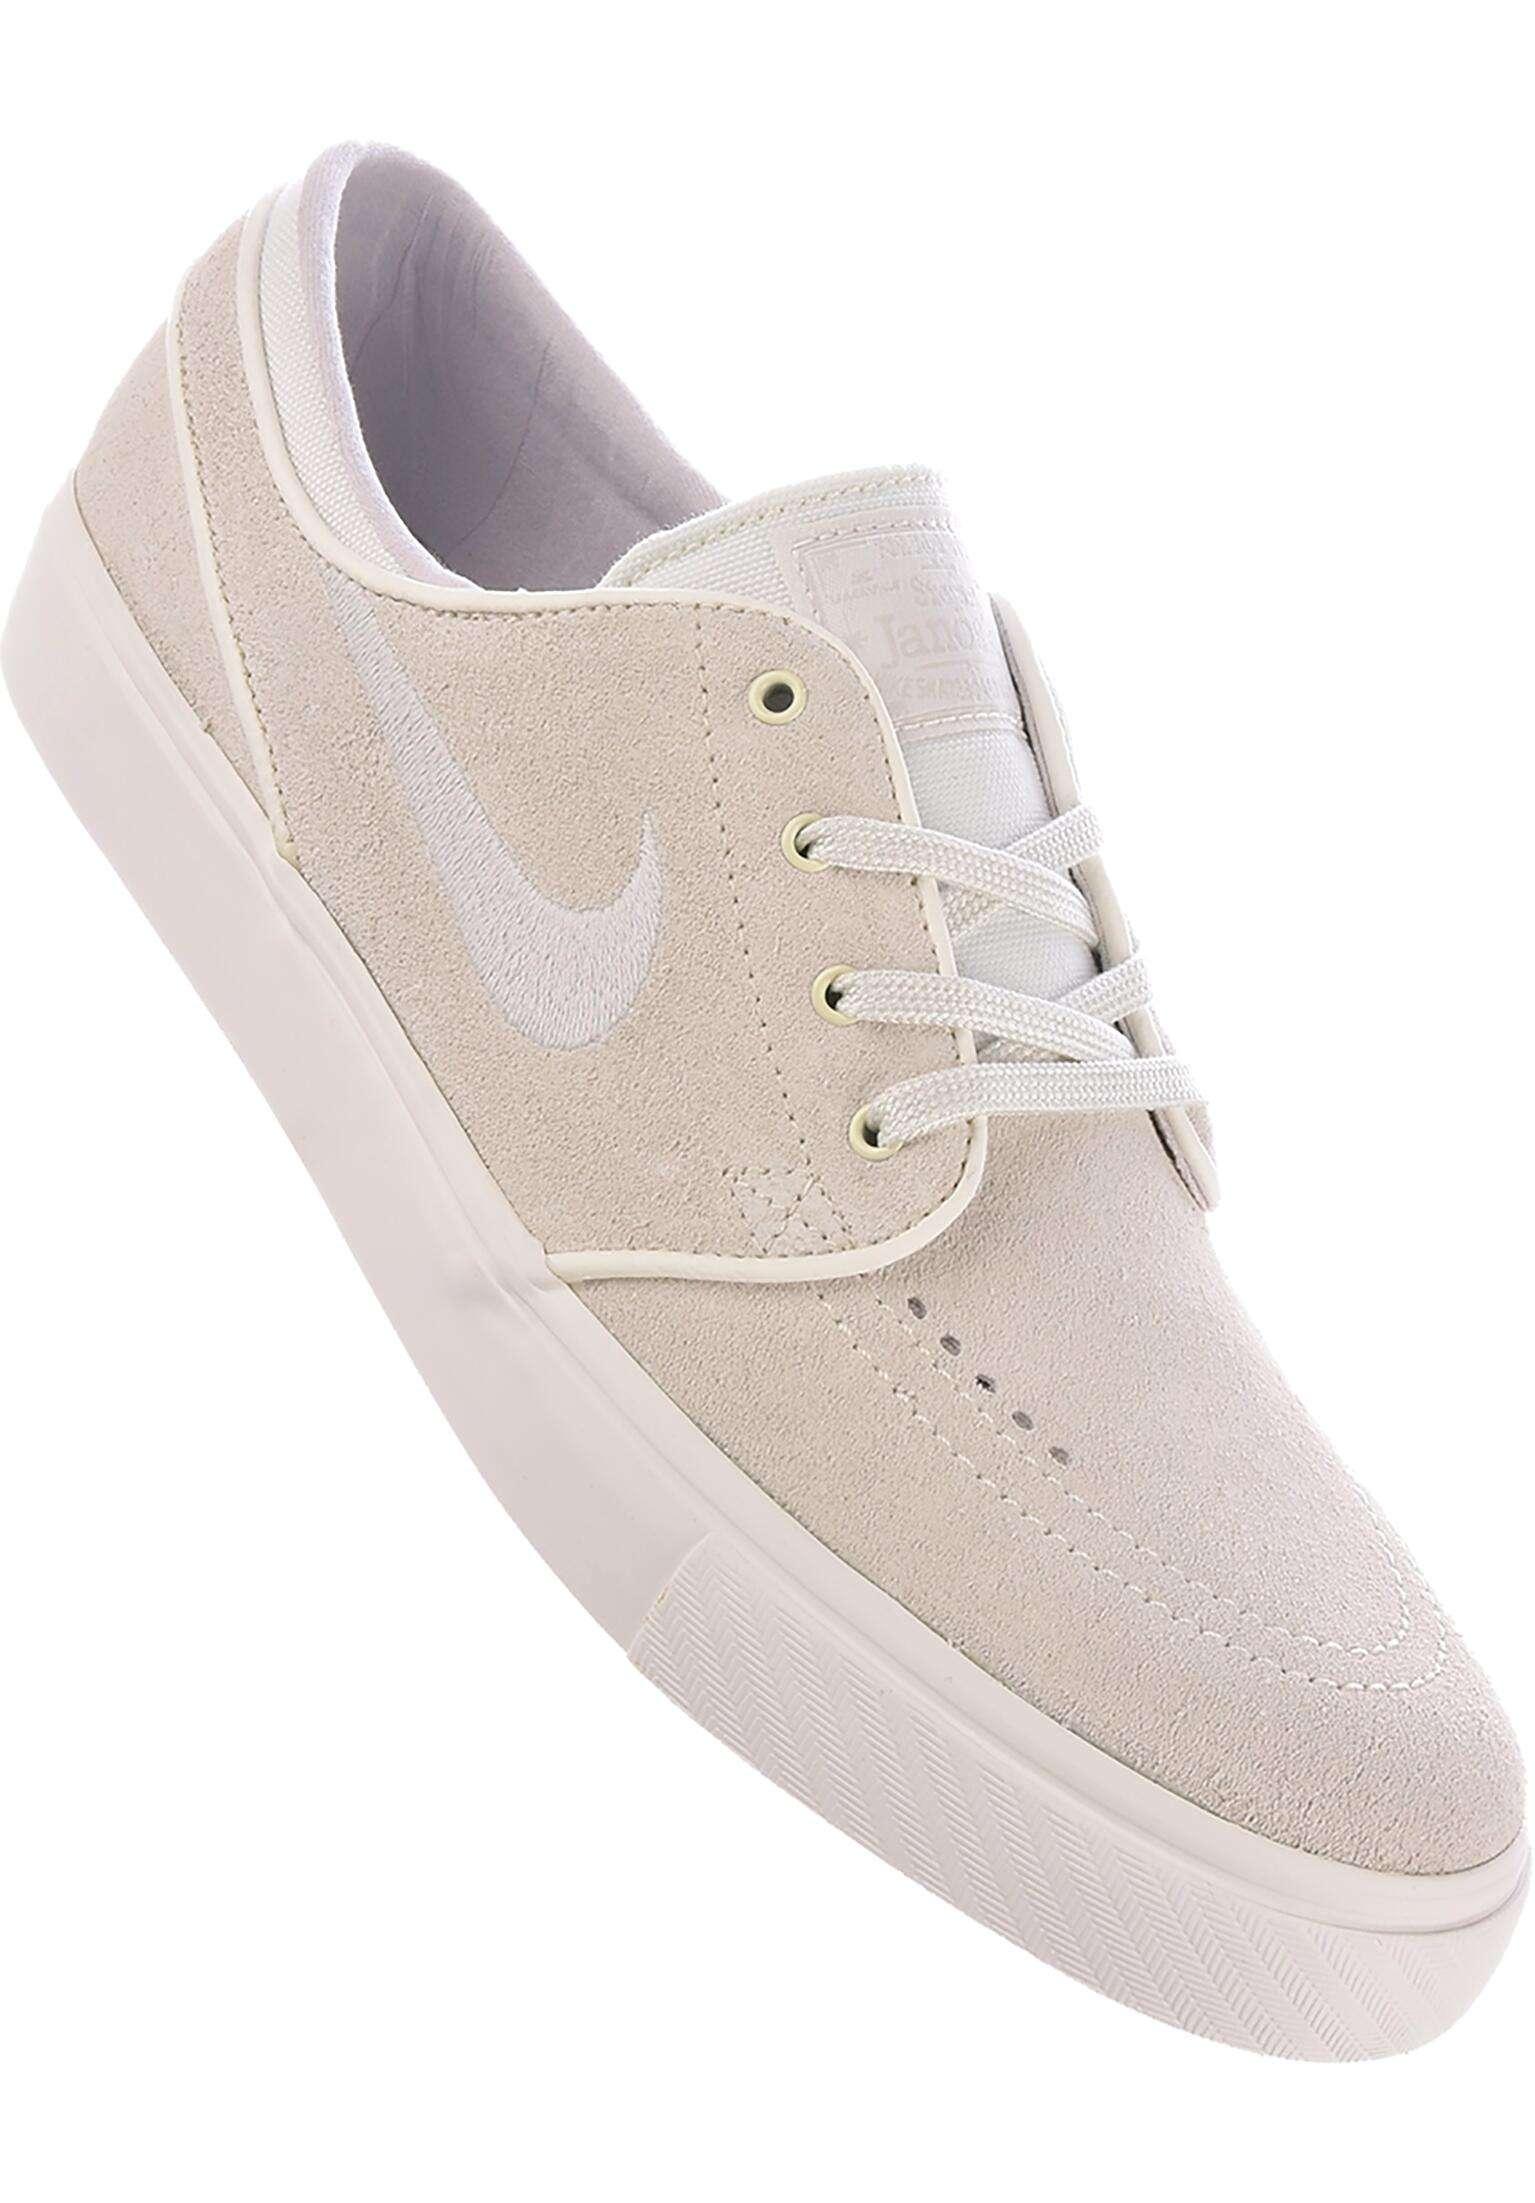 cheap for discount 24f1c bcfbb Zoom Stefan Janoski Nike SB All Shoes in summitwhite-vastgrey for Men    Titus